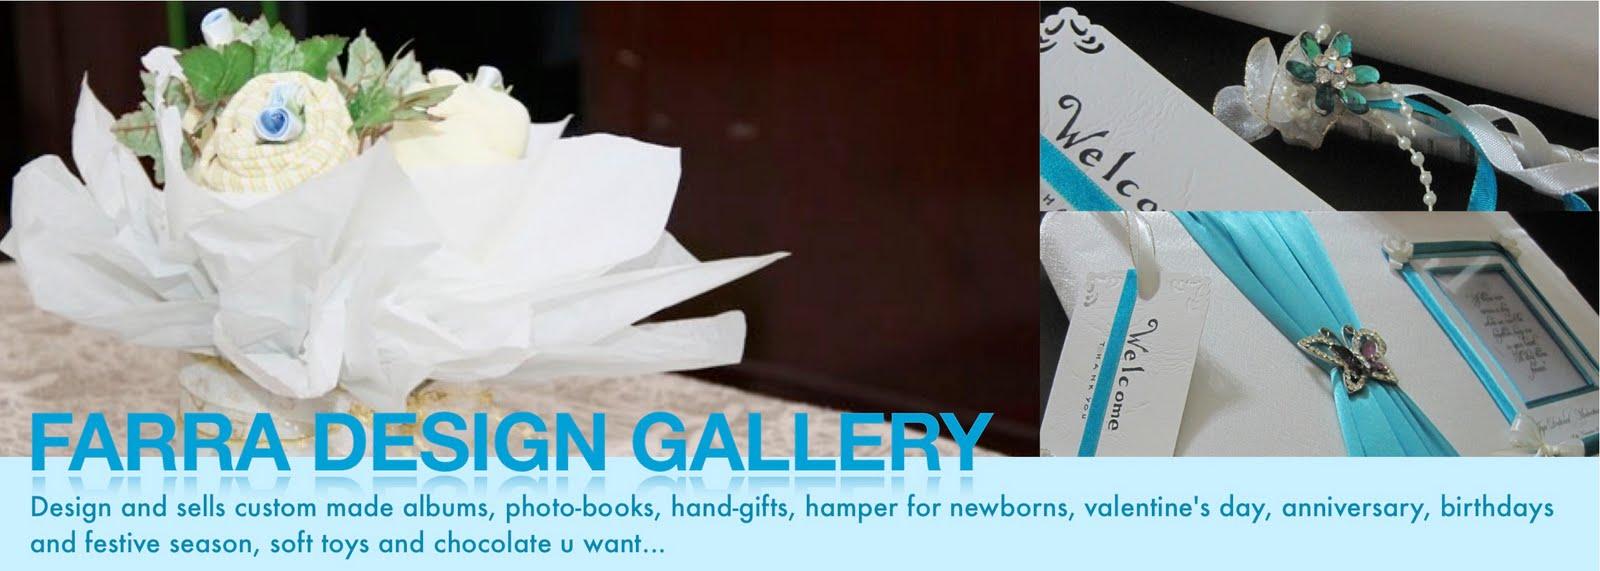 Farra Design Gallery...